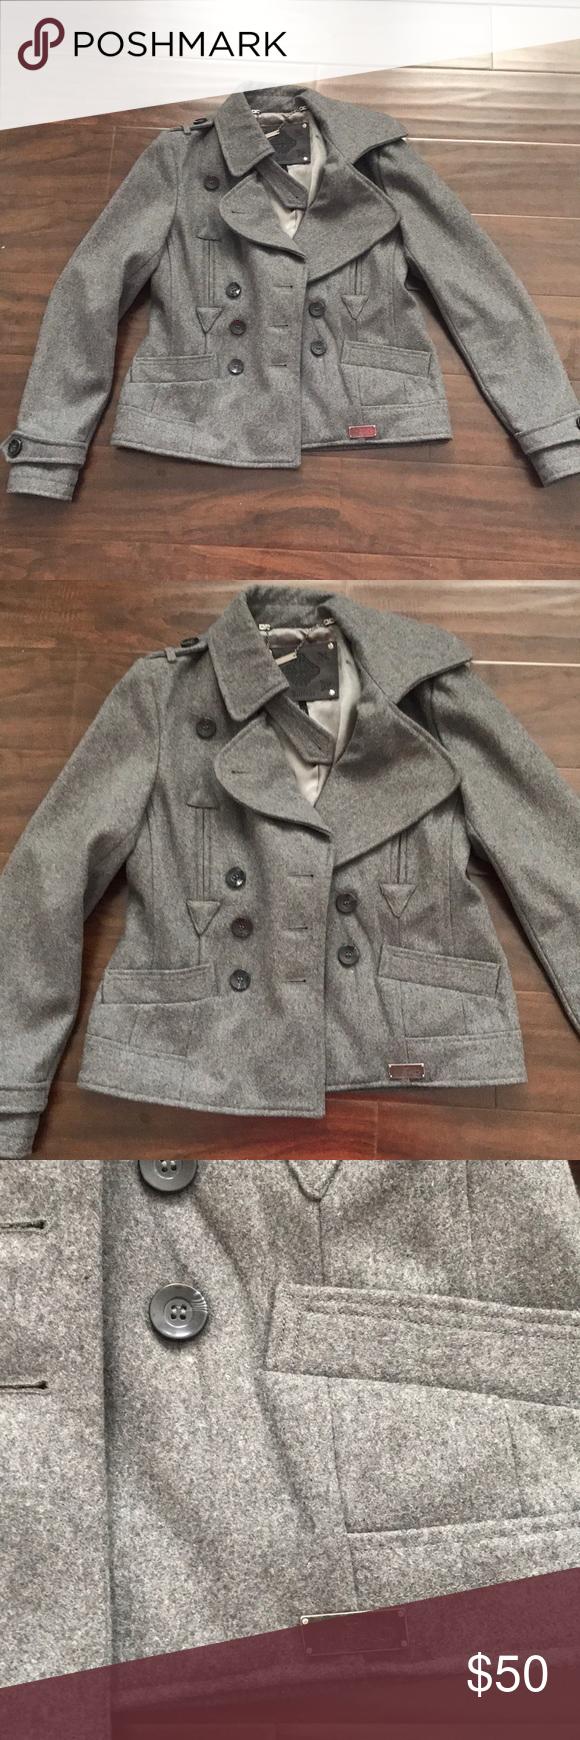 Buffalo David Bitton Grey Pea Coat Jacket Peacoat Jacket Peacoat Grey Pea Coat [ 1740 x 580 Pixel ]